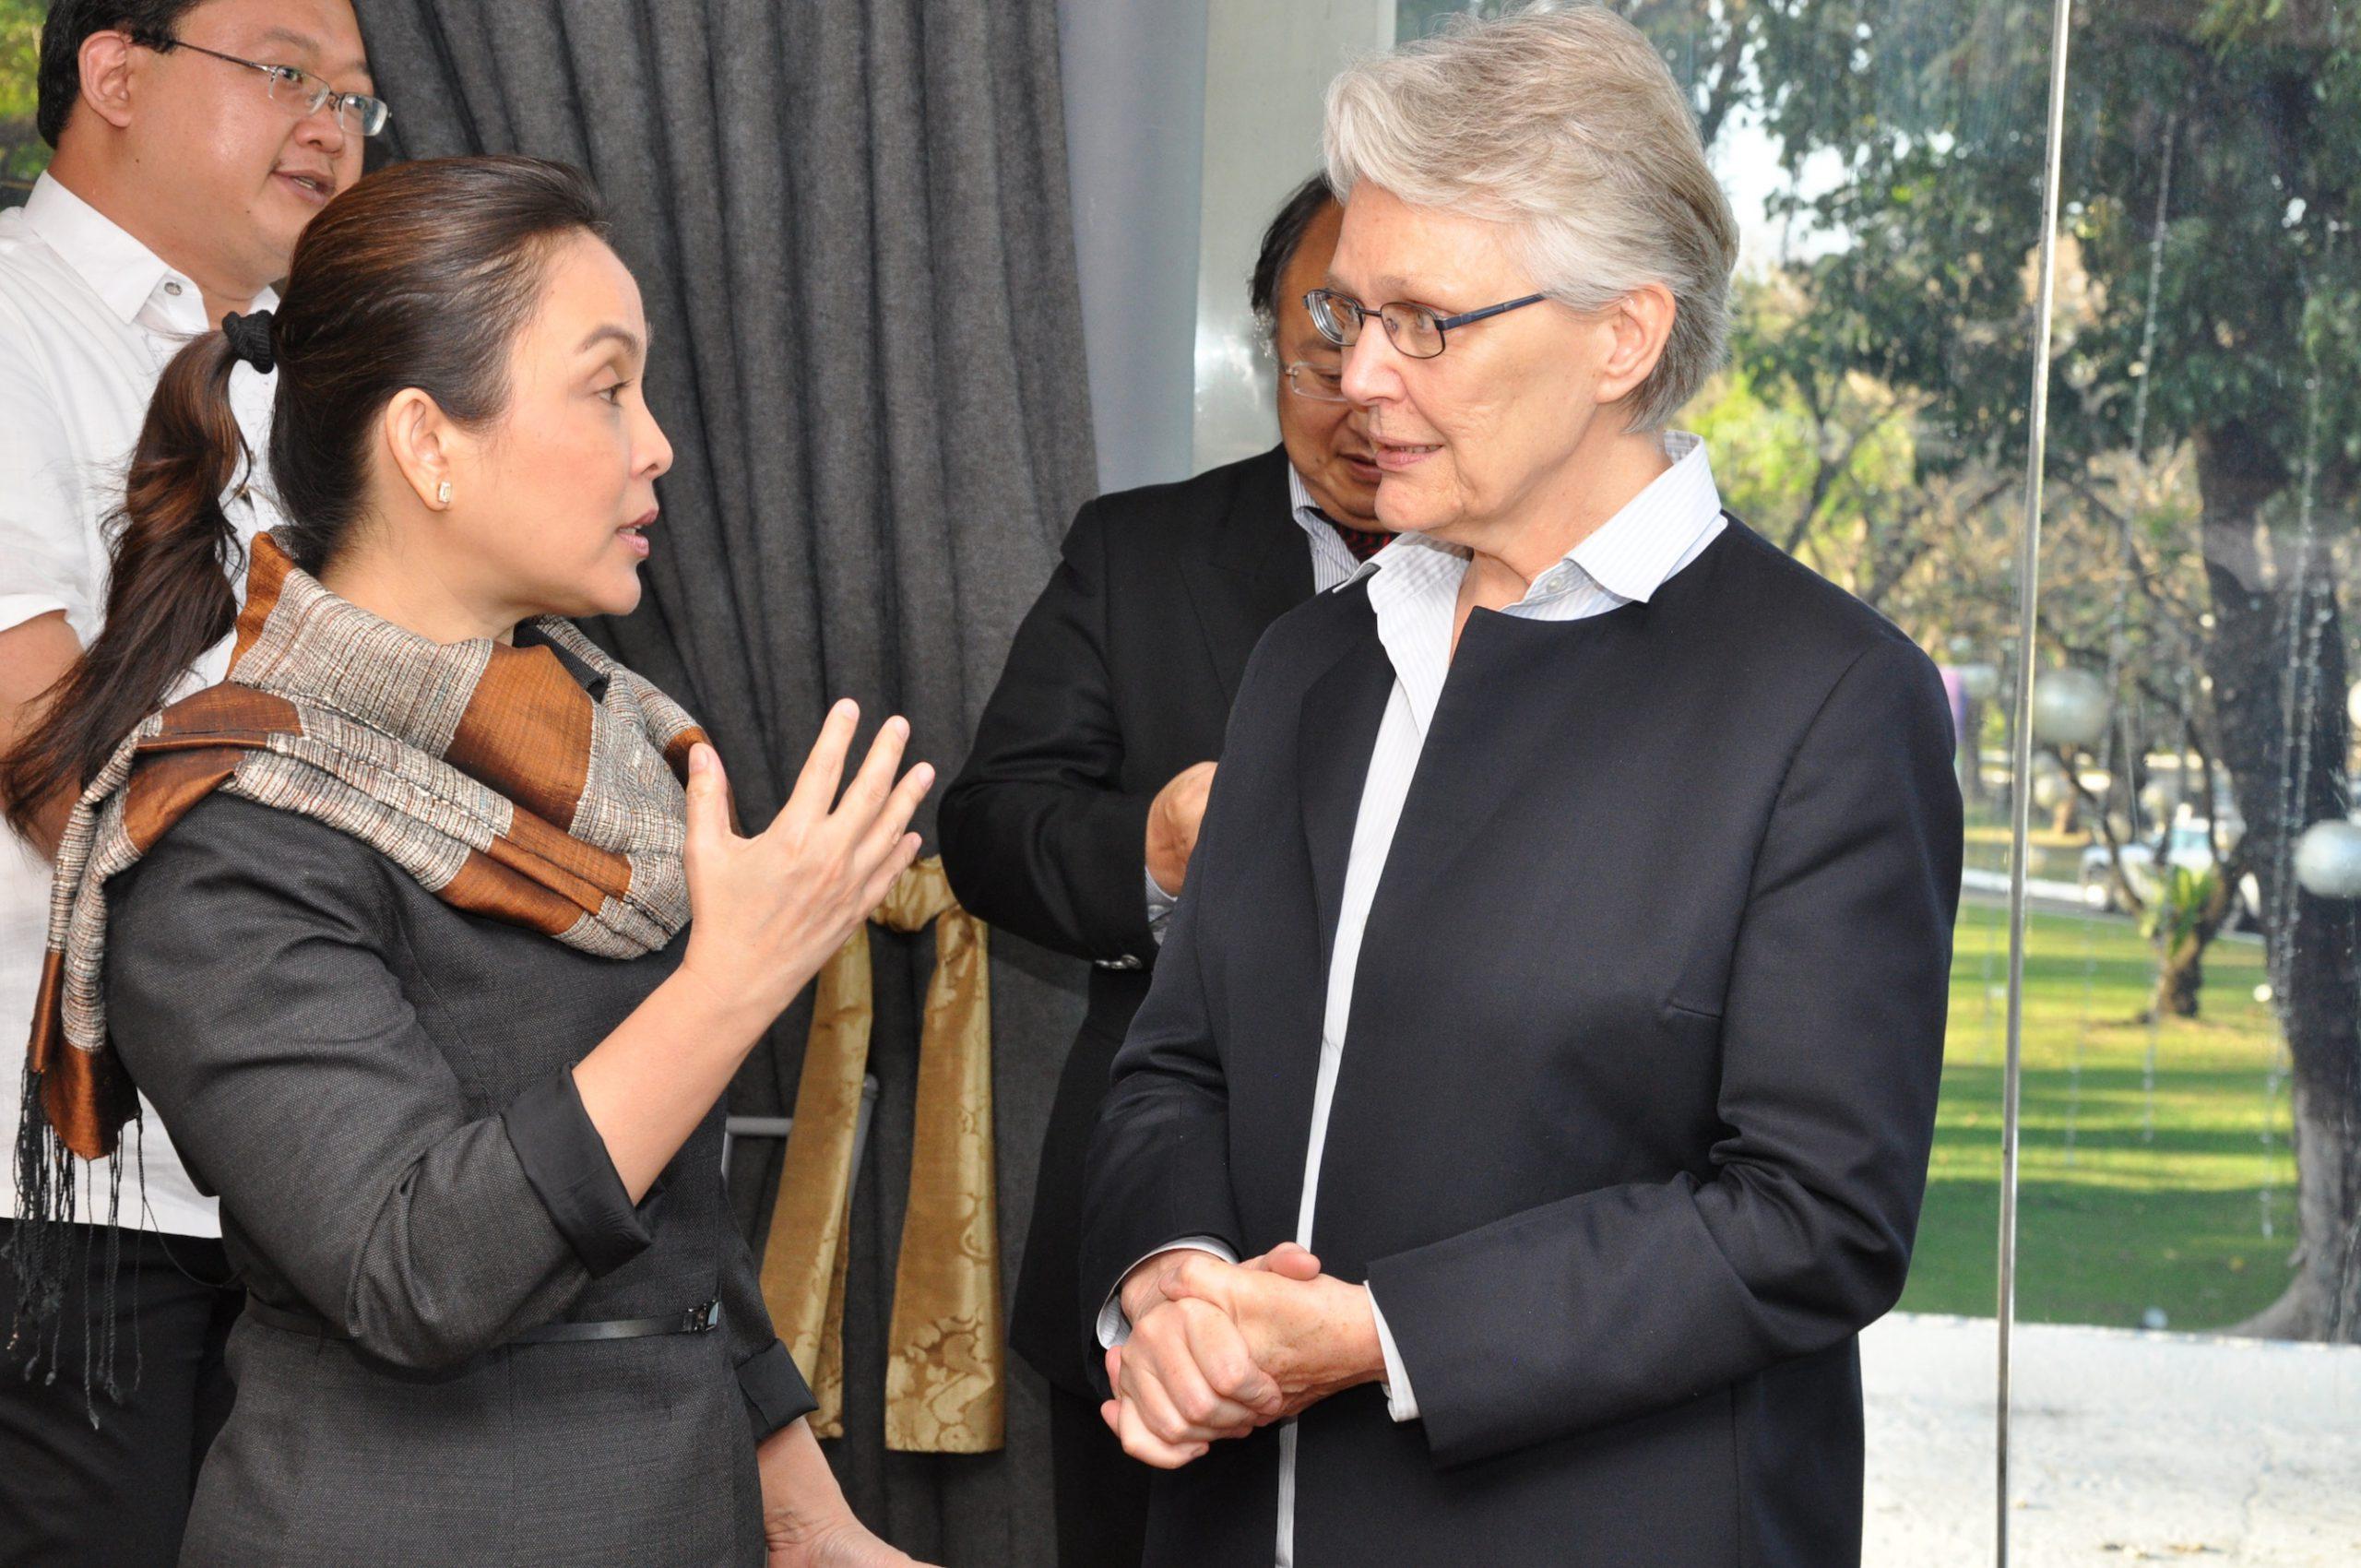 Senator Legarda and Ms. Margareta Wahlström